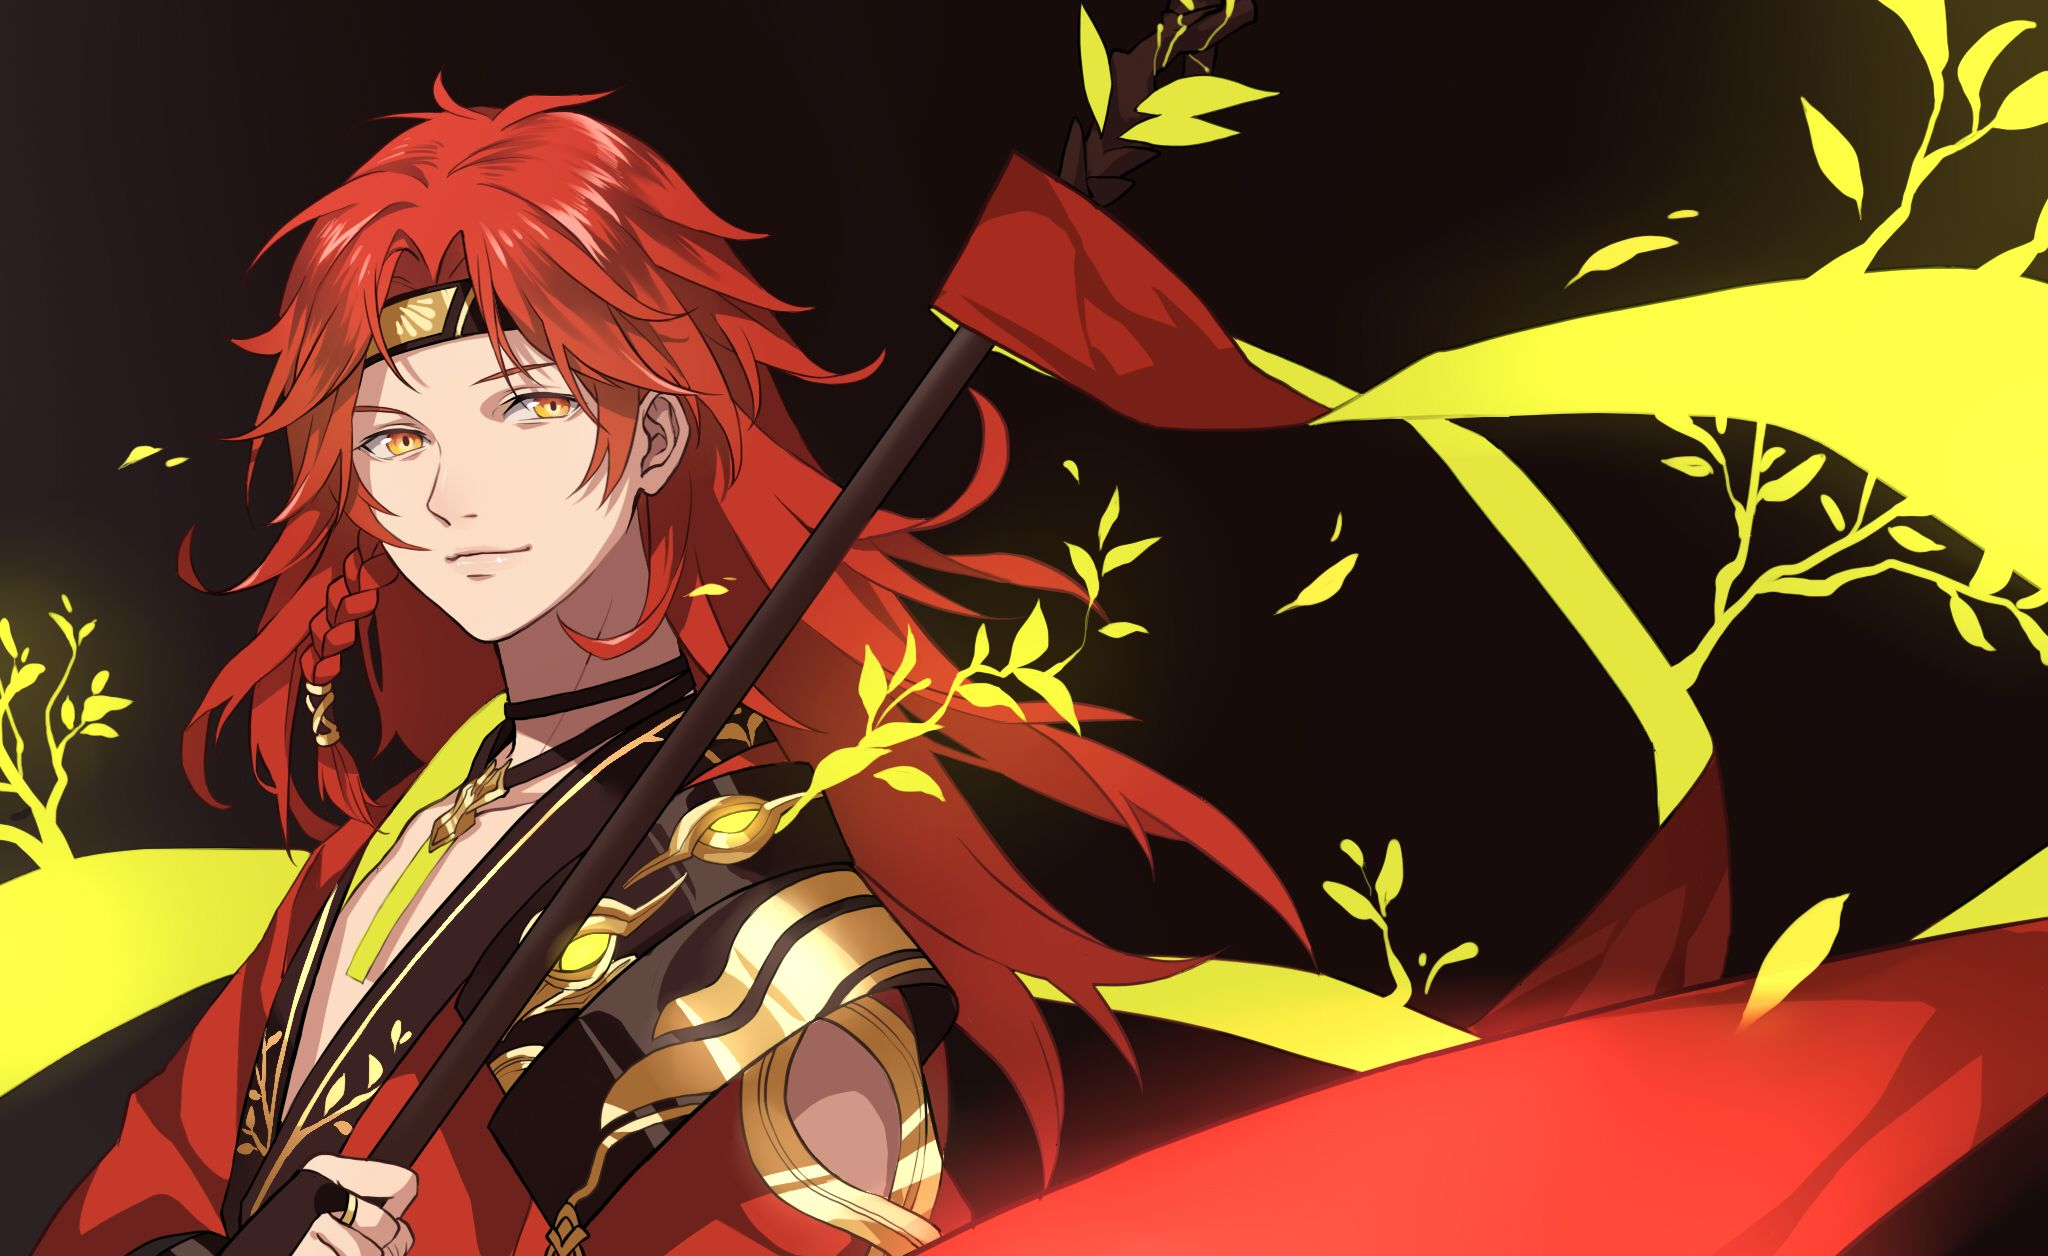 Image Result For Honkai Impact 3rd Homu Red Anime Redhead Anime Anime Boy